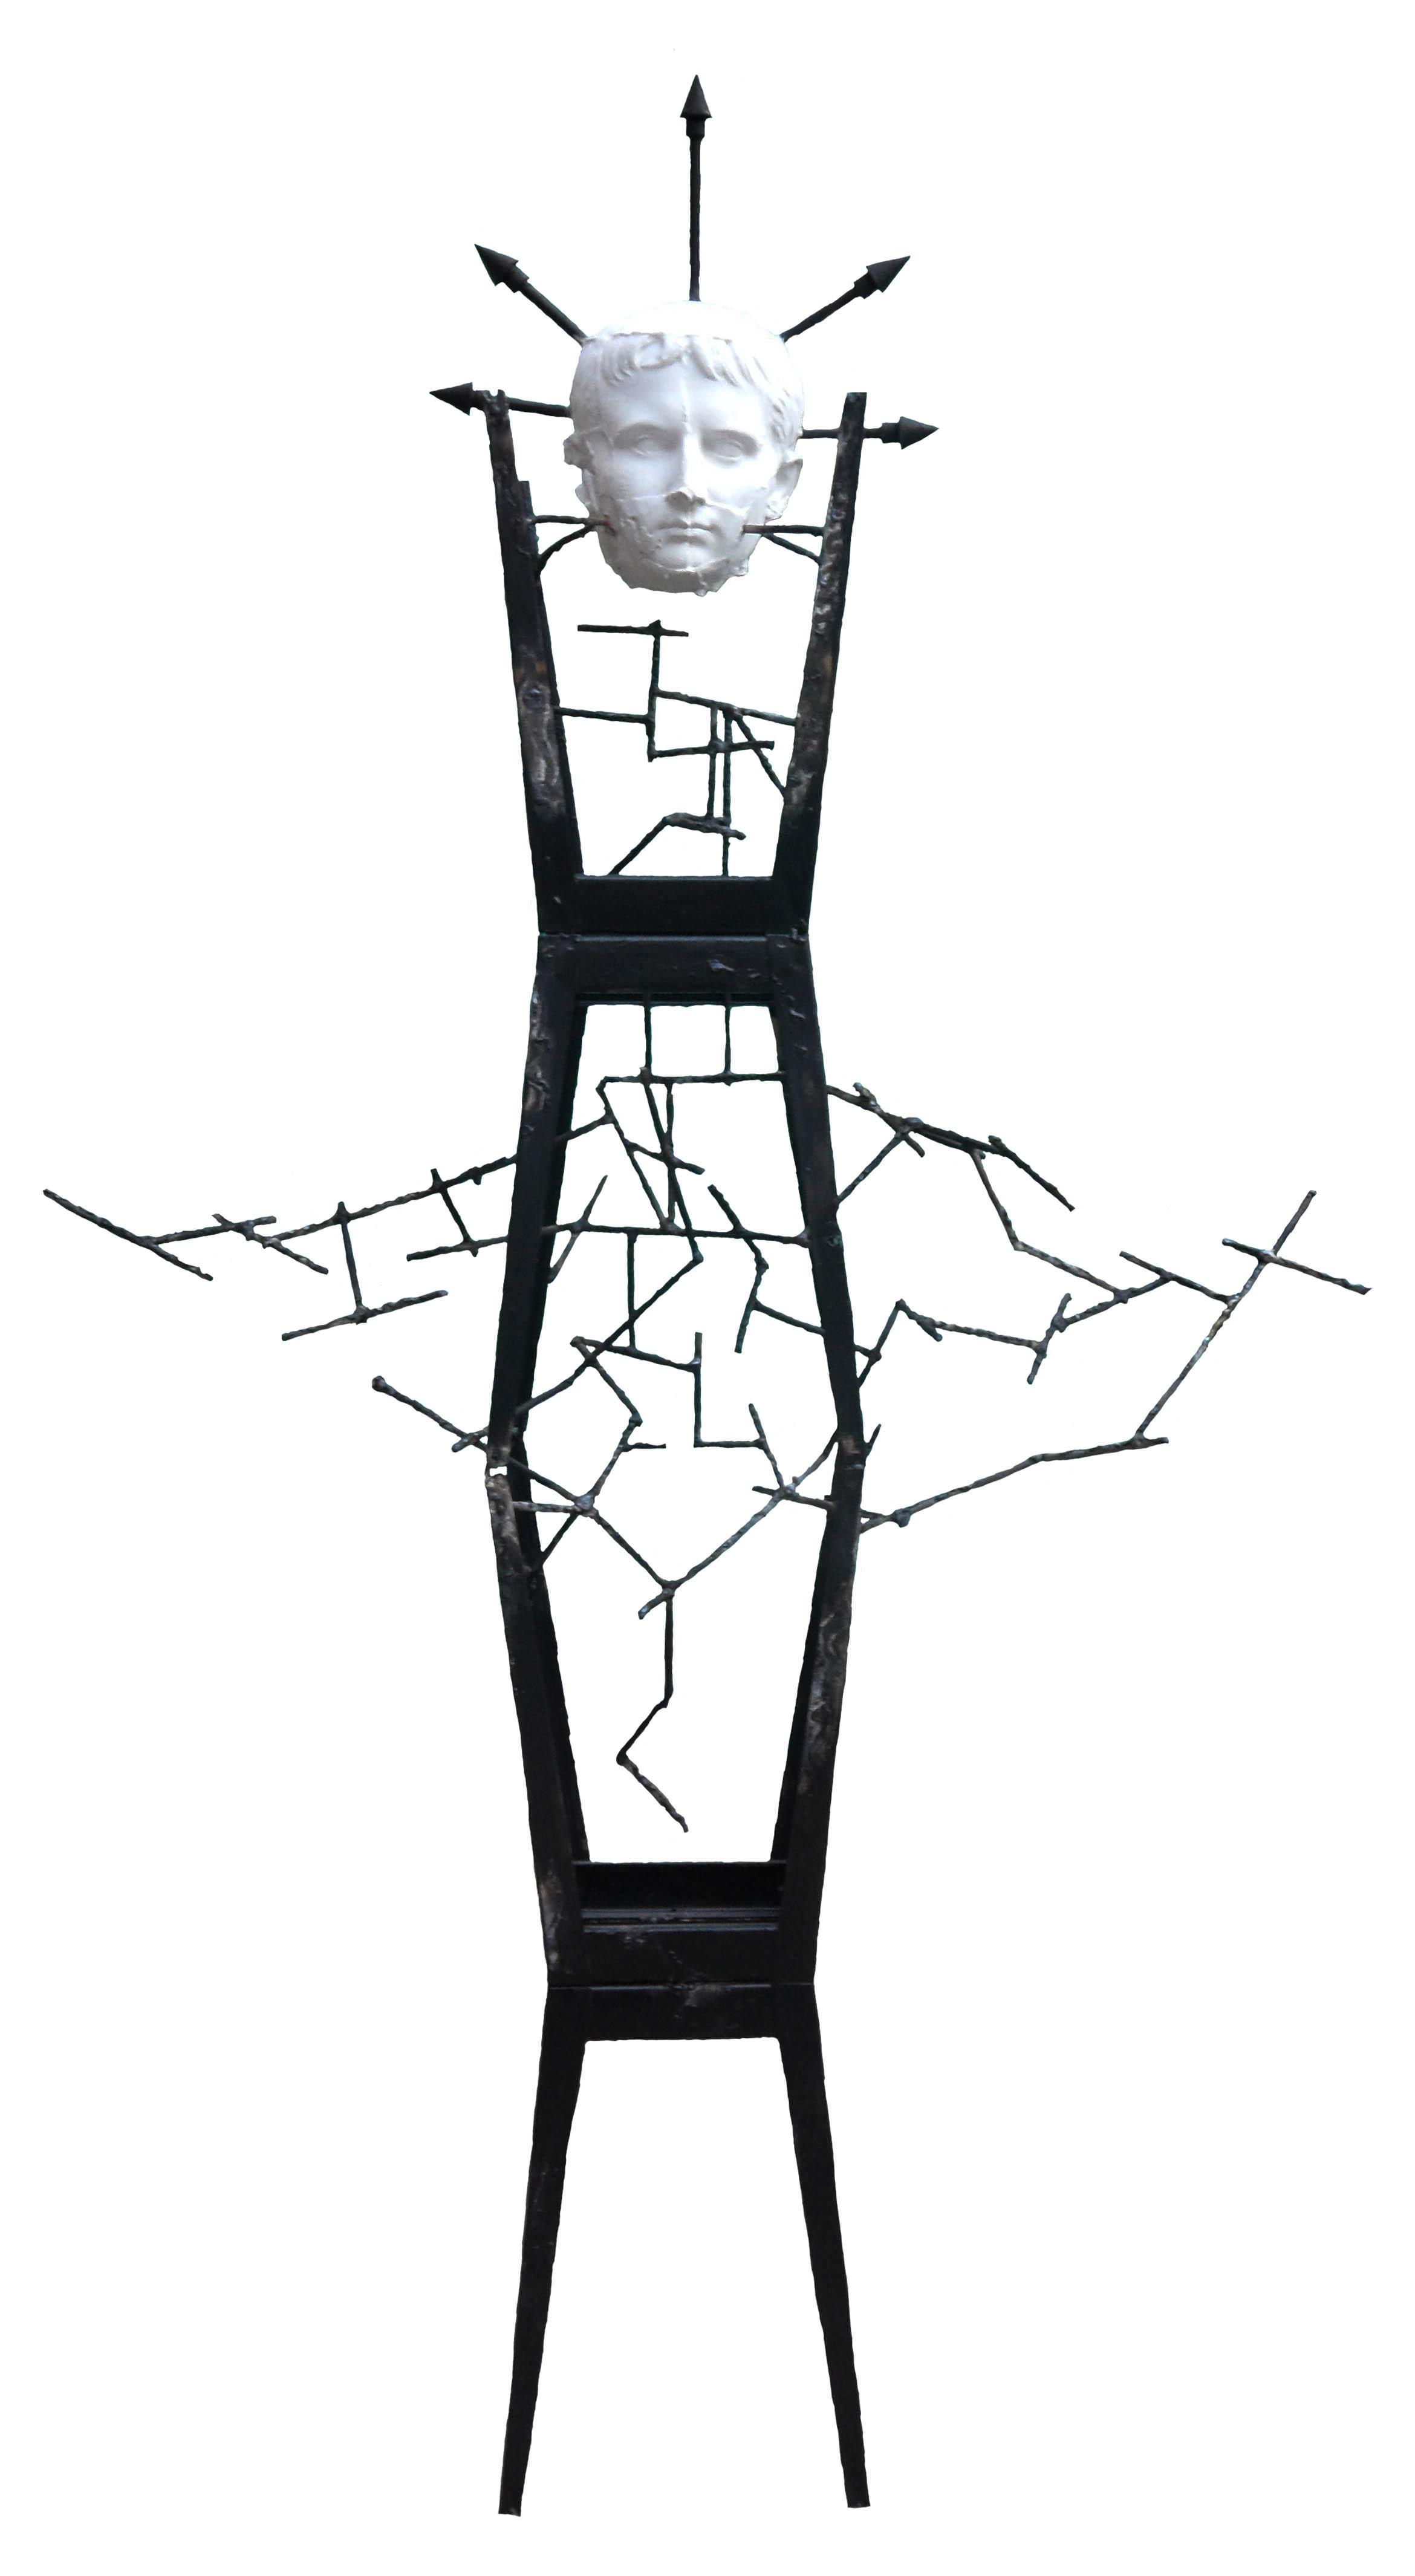 Тысячи теней невозмутимой тишины, 160х100х60 см, 2015, металл, сварка, гипс